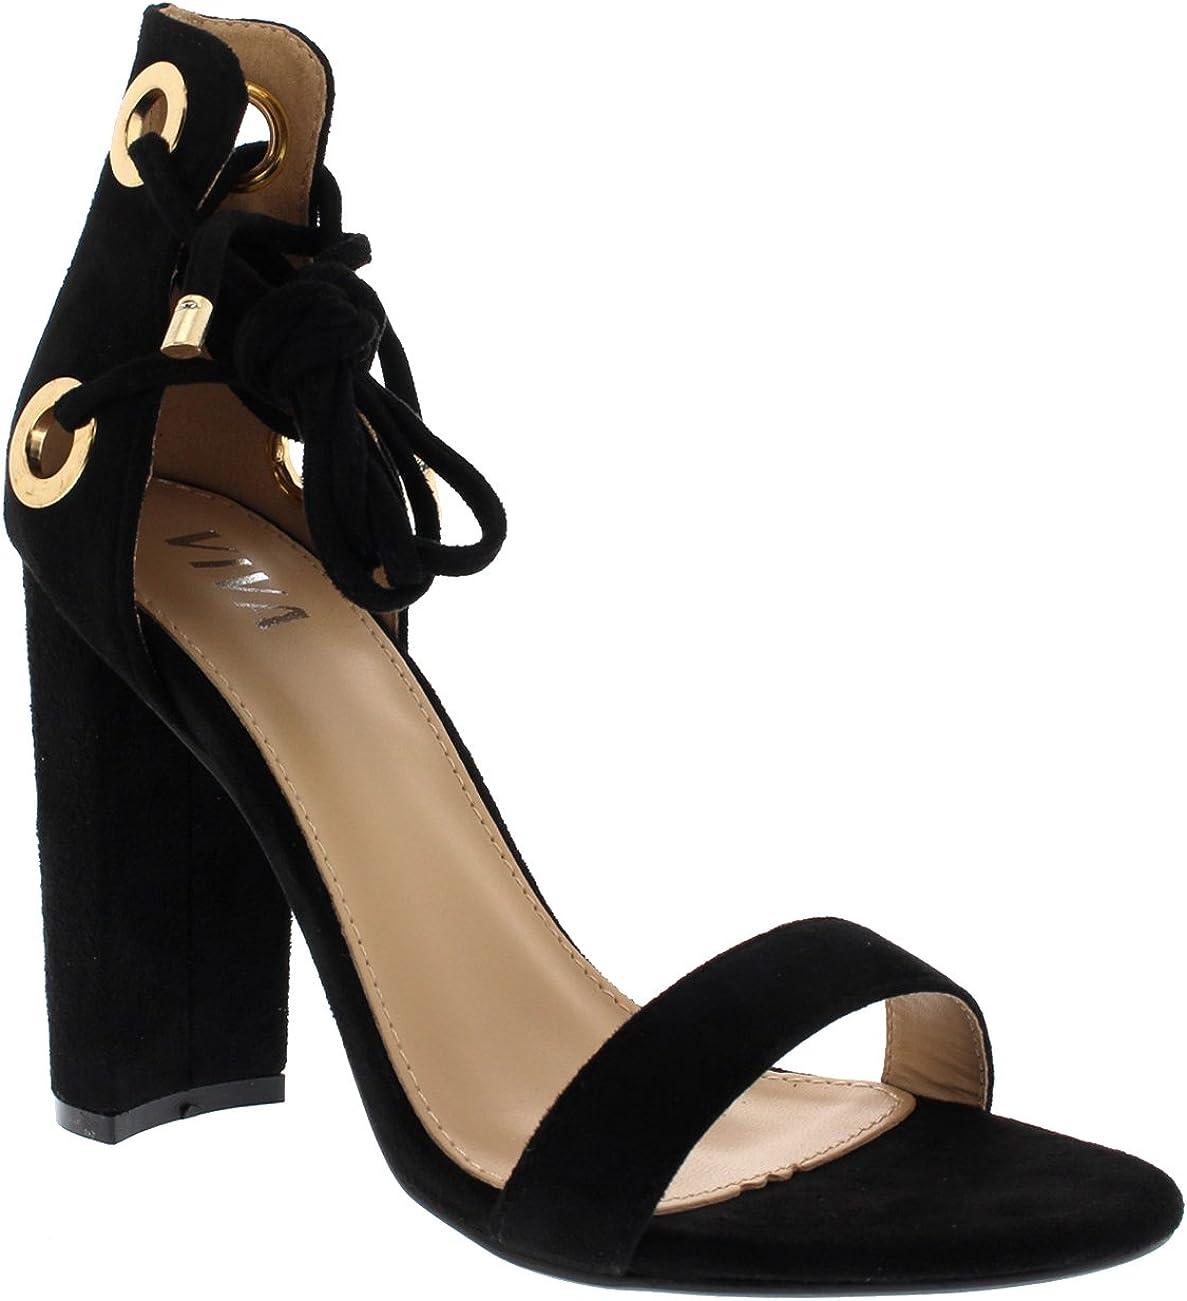 VIVA Womens Block High Heel Suede Lace Tie Up Suede Sandals Shoes